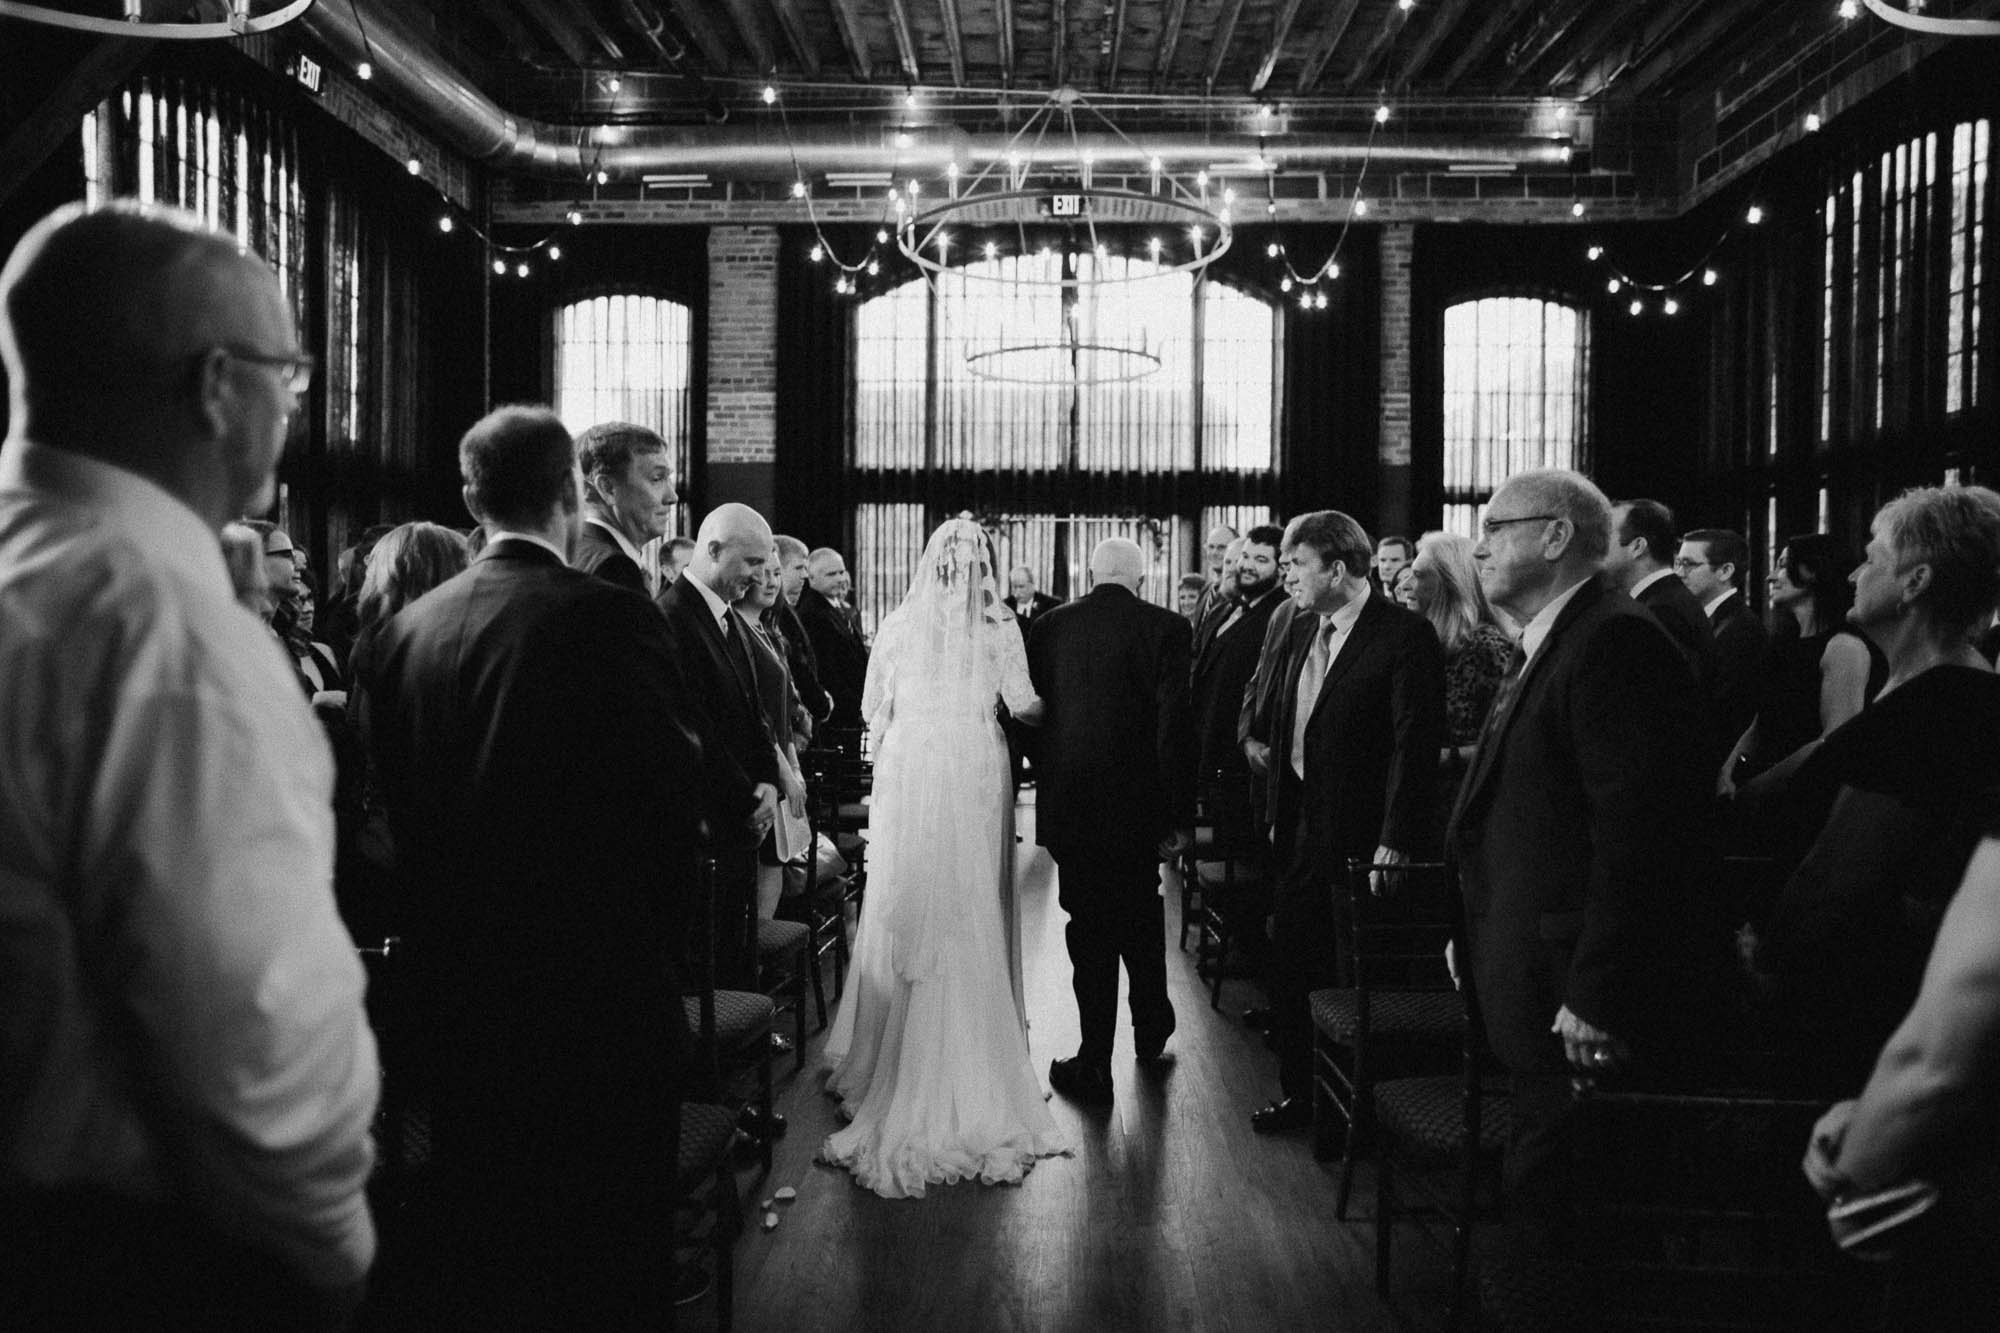 Highline-Car-House-Wedding-Columbus-Kristin-Aaron-072.jpg